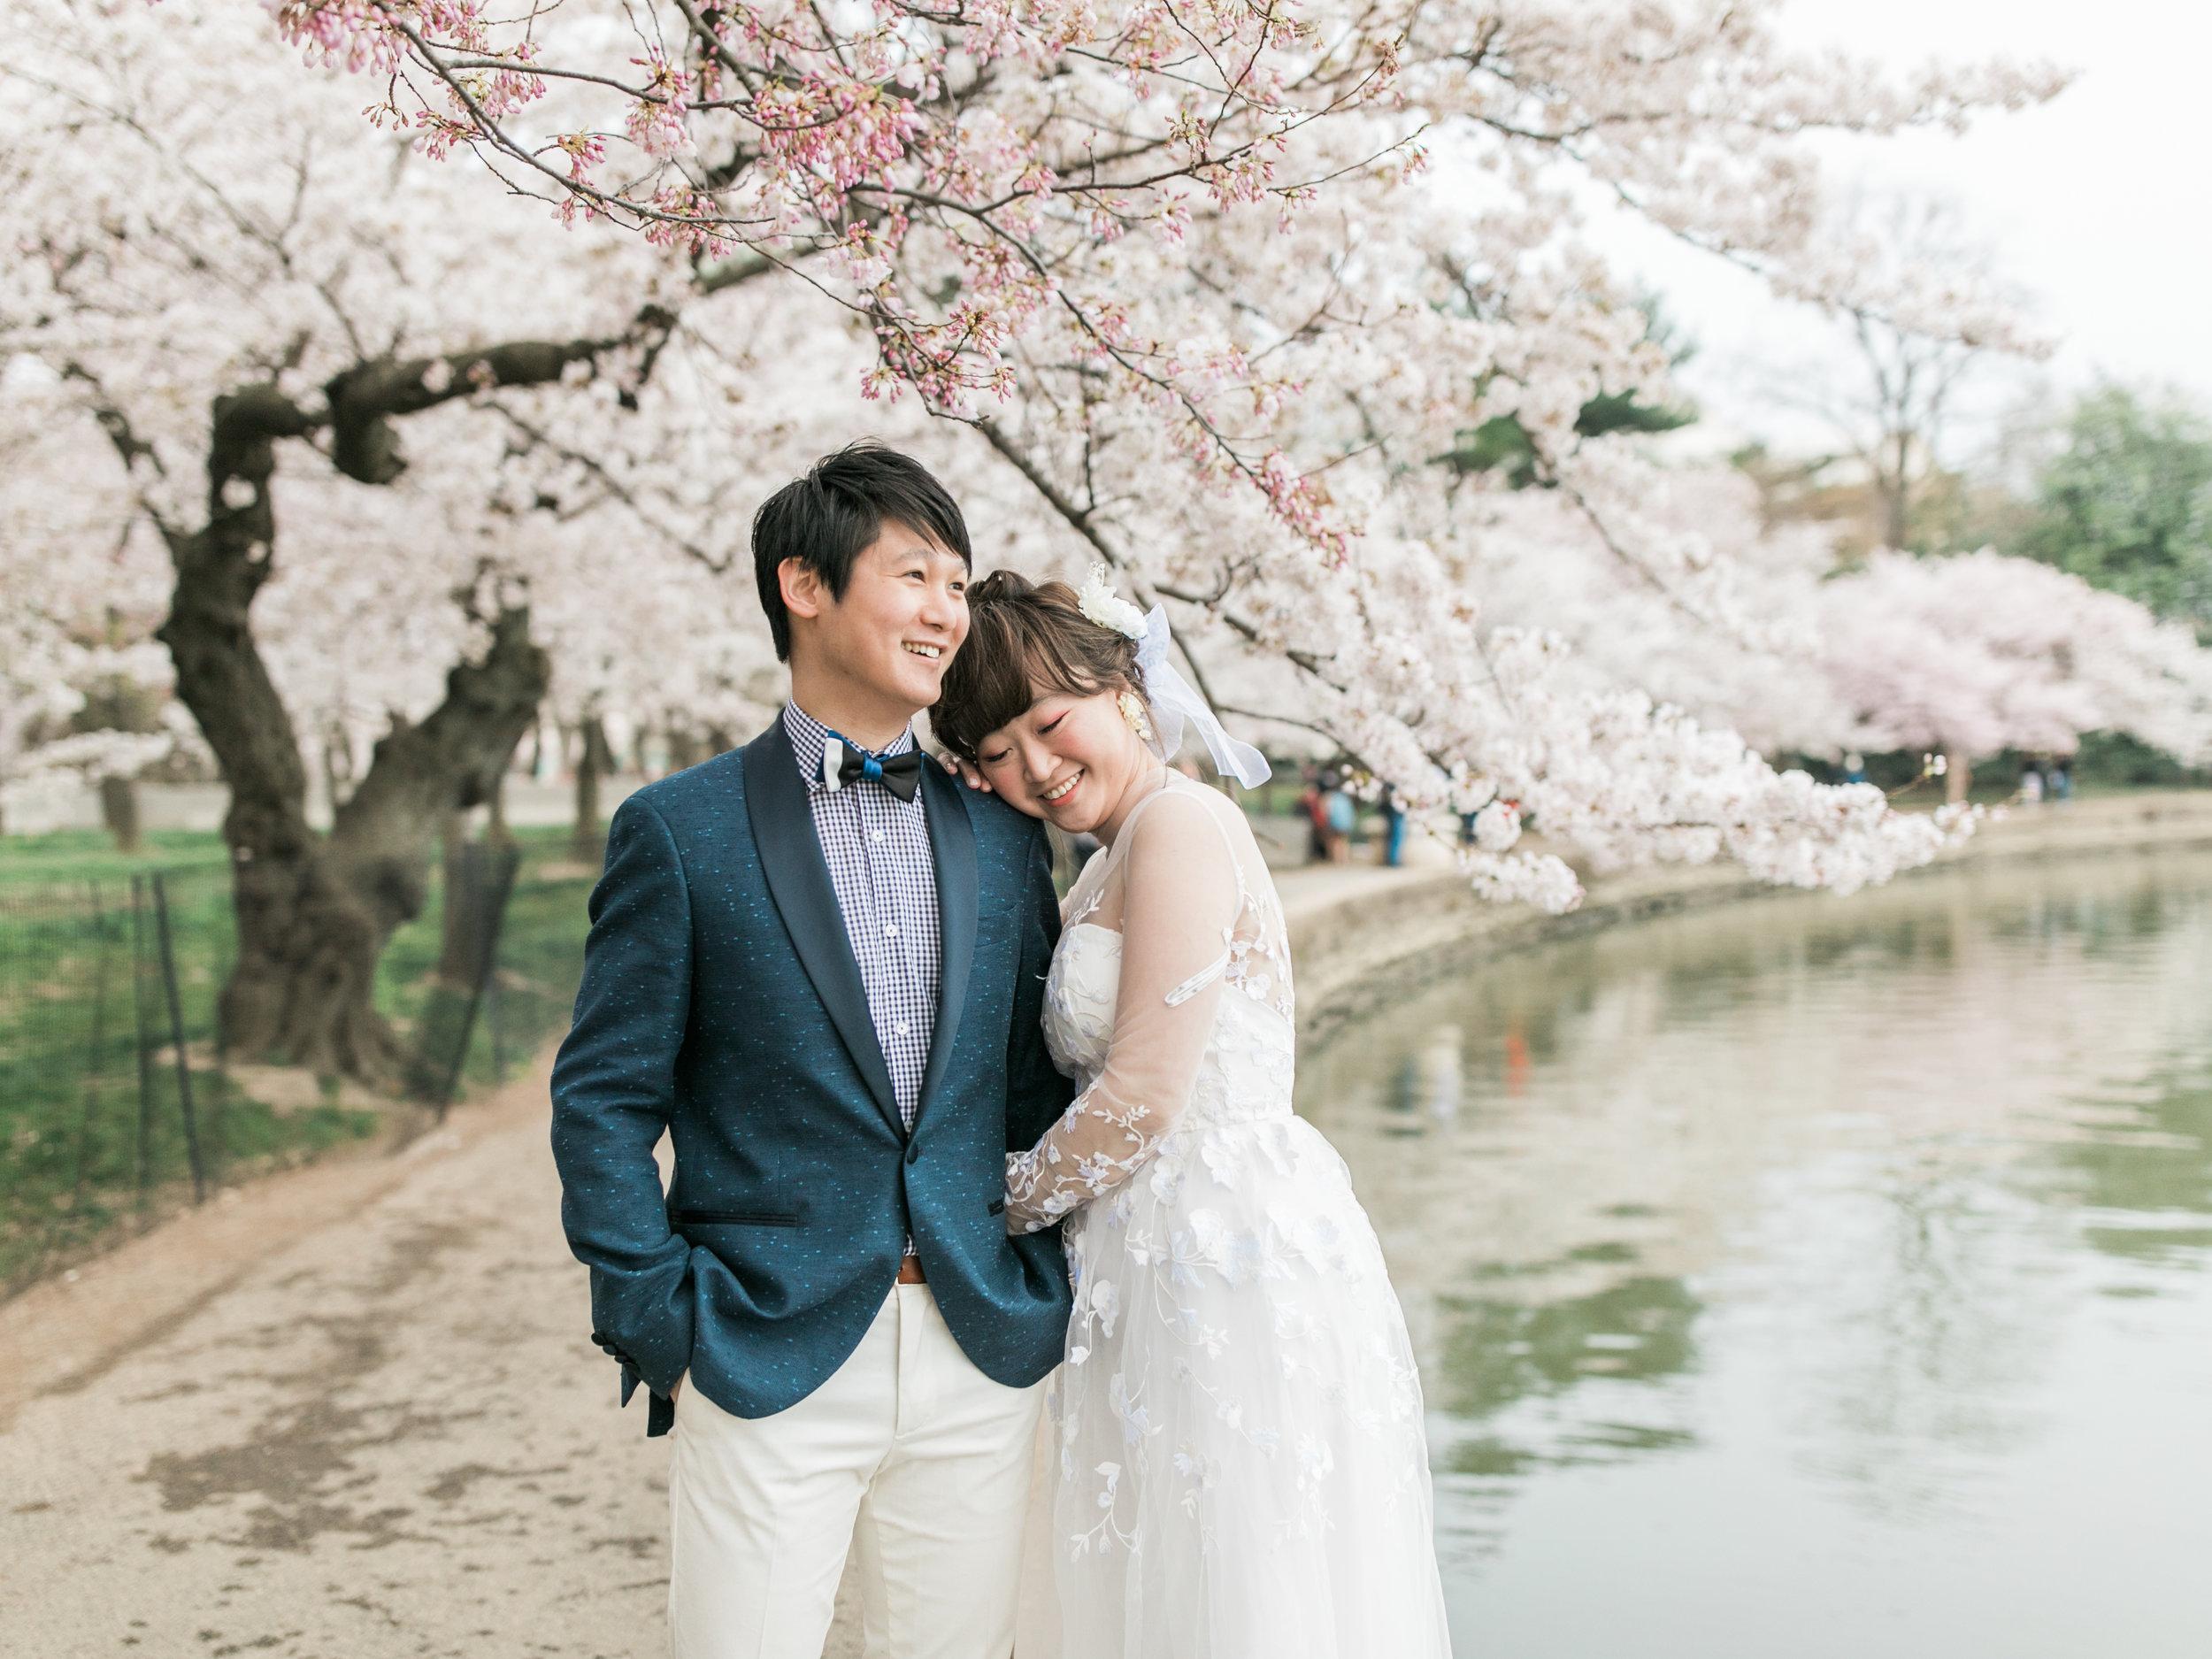 cherry-blossom-engagement-photos3.jpg